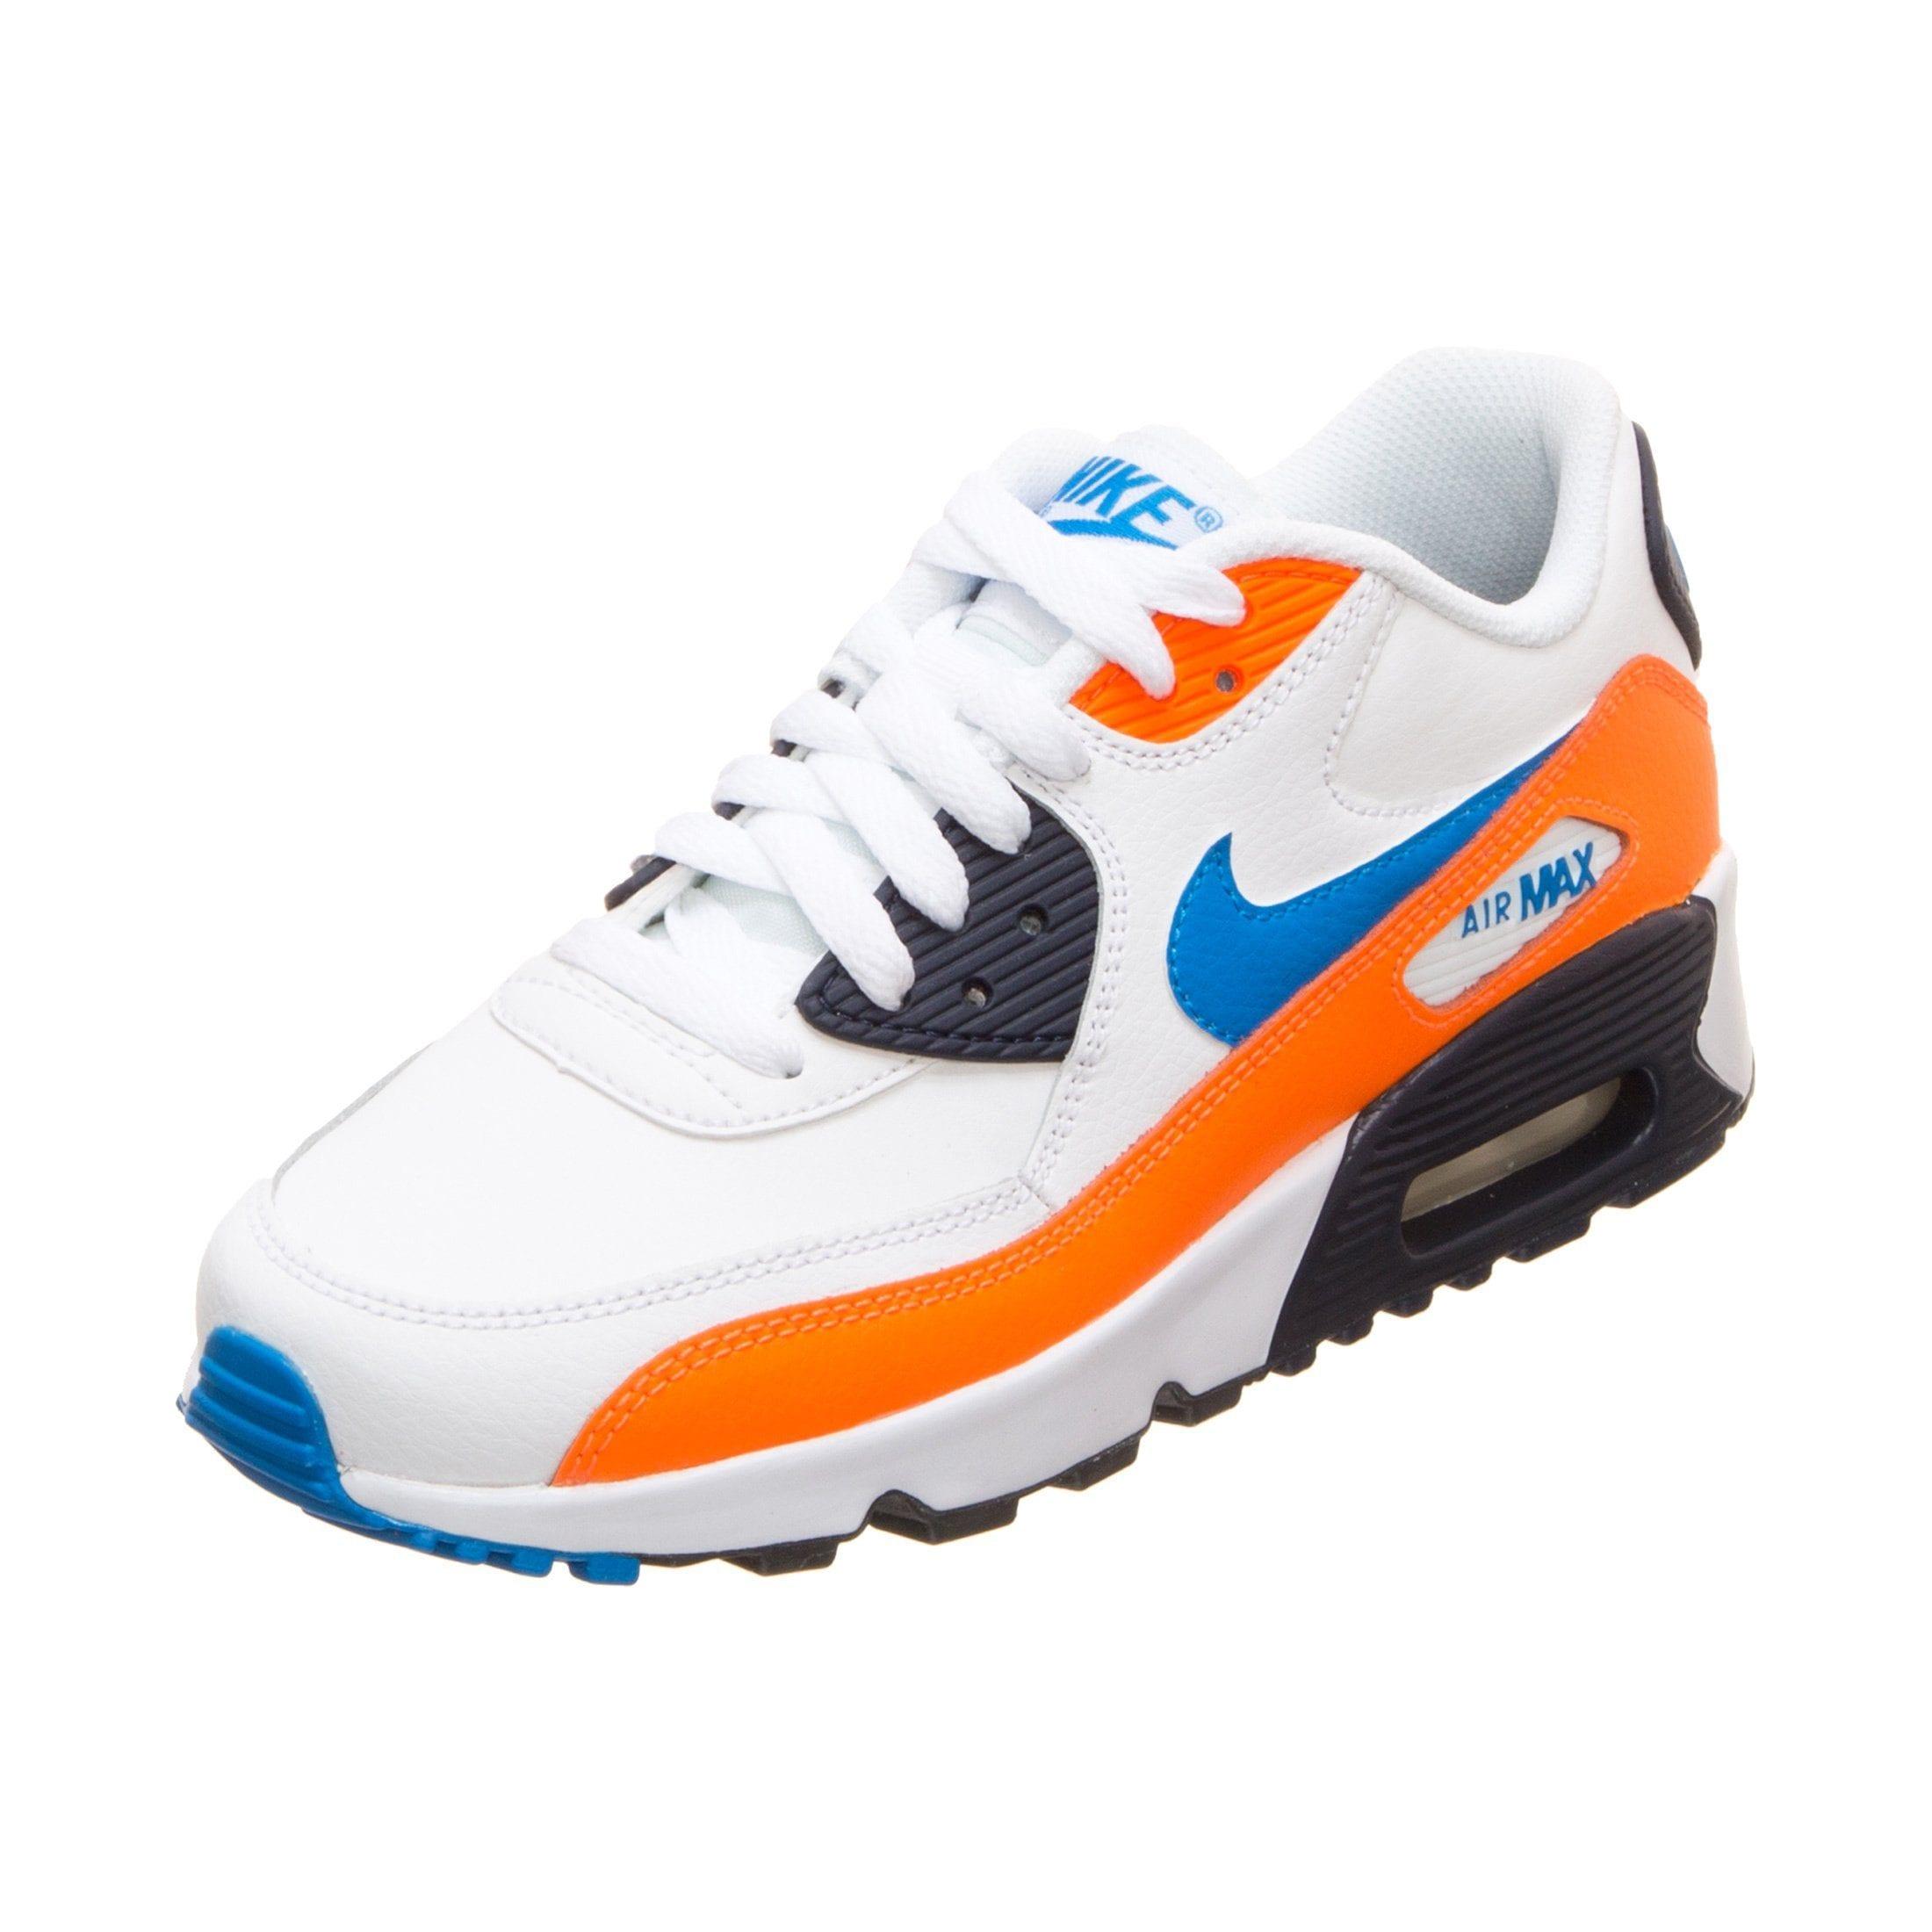 more photos latest design lowest price Nike Sportswear Sneaker »Air Max 90 Leather« online bestellen | BAUR